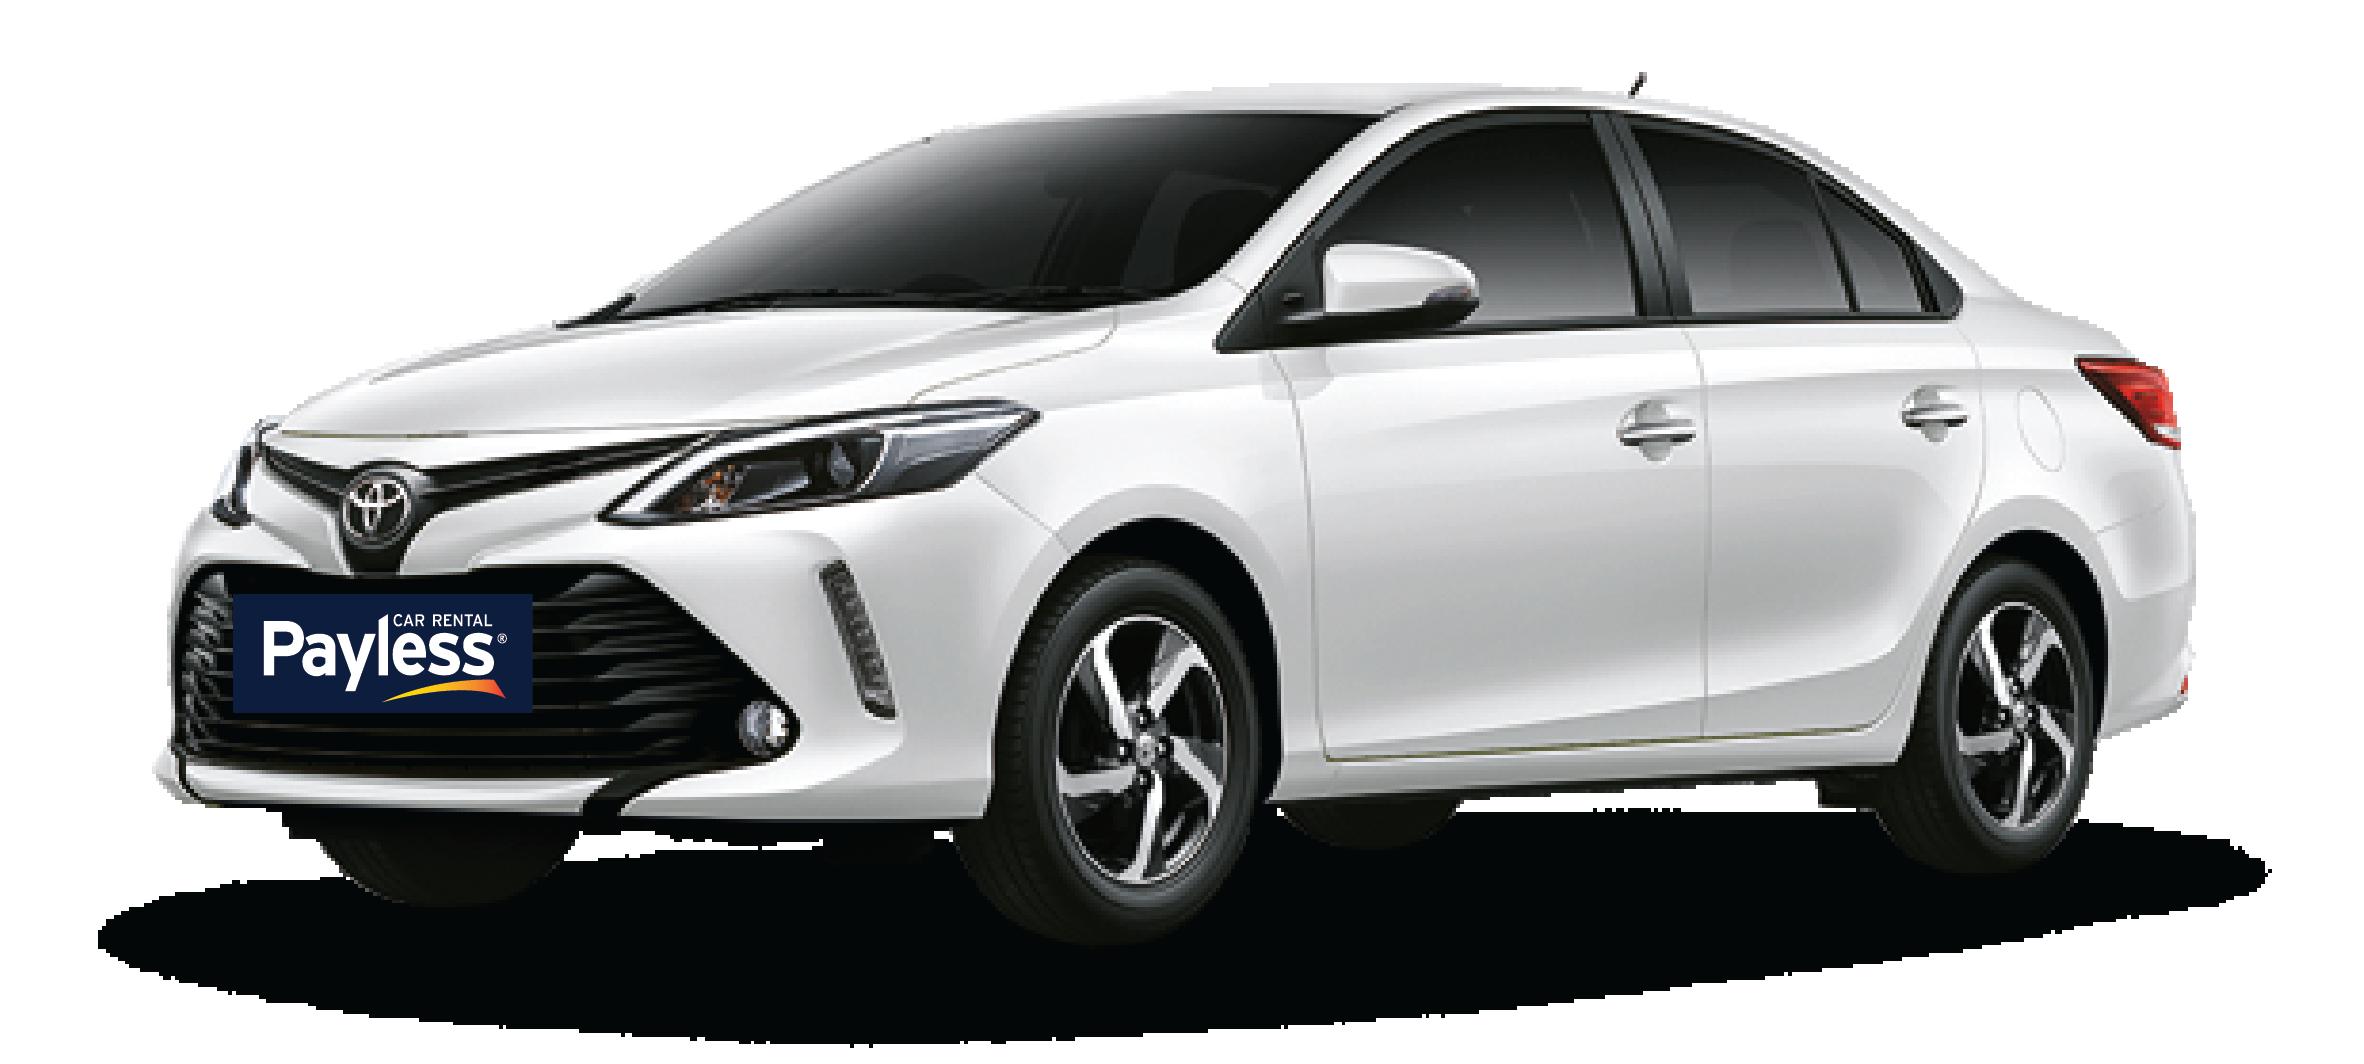 Toyota Vios or similar